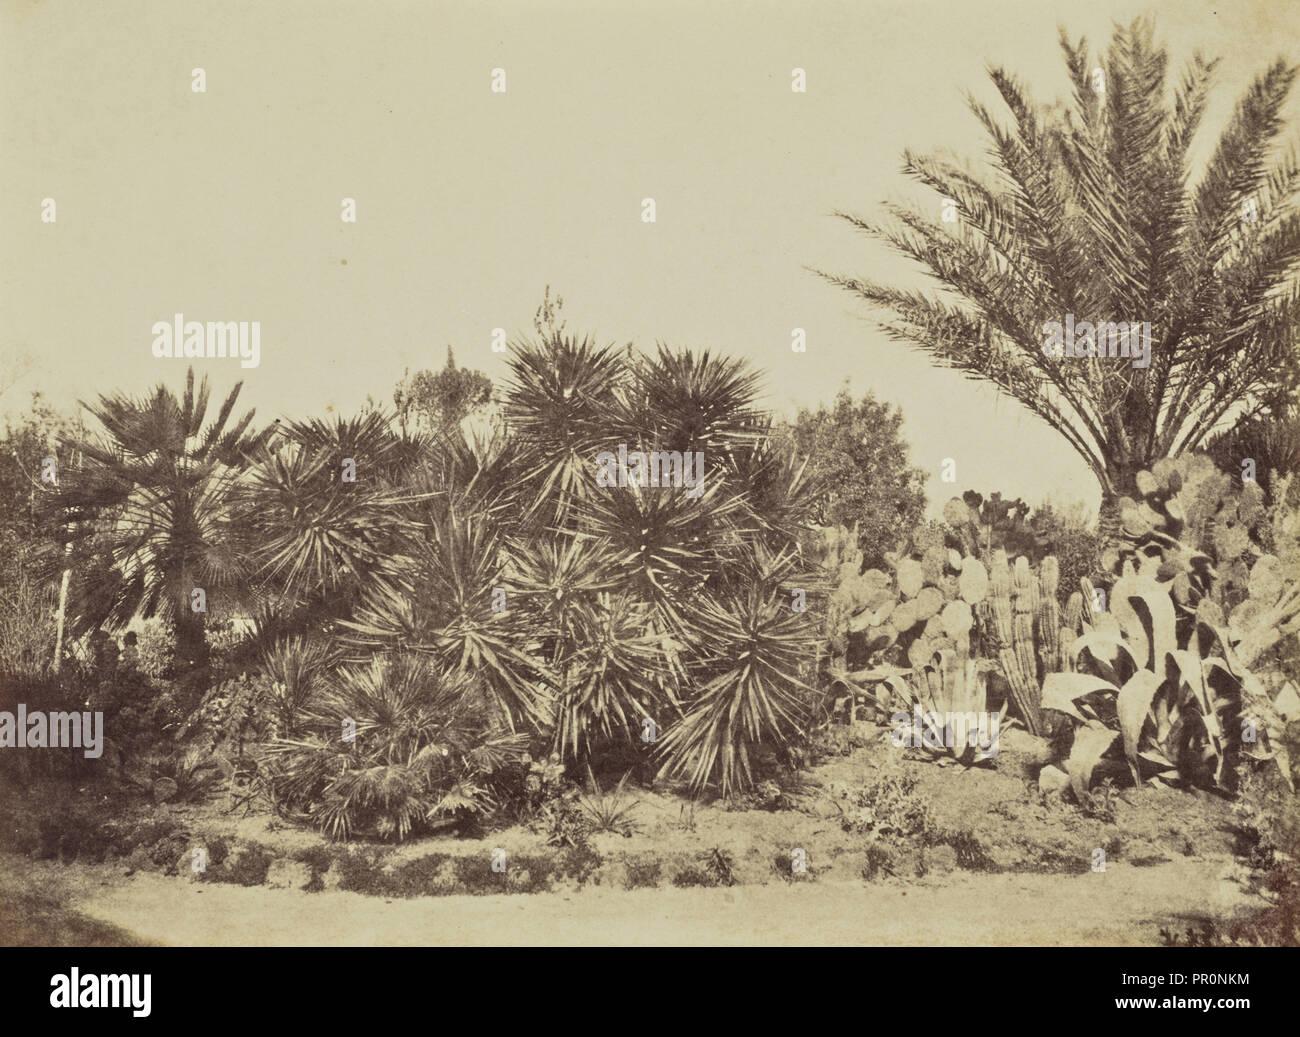 Garden on Monte Pincio, Rome; Mrs. Jane St. John, British, 1803 - 1882, Rome, Italy; 1856 - 1859; Albumen silver print - Stock Image